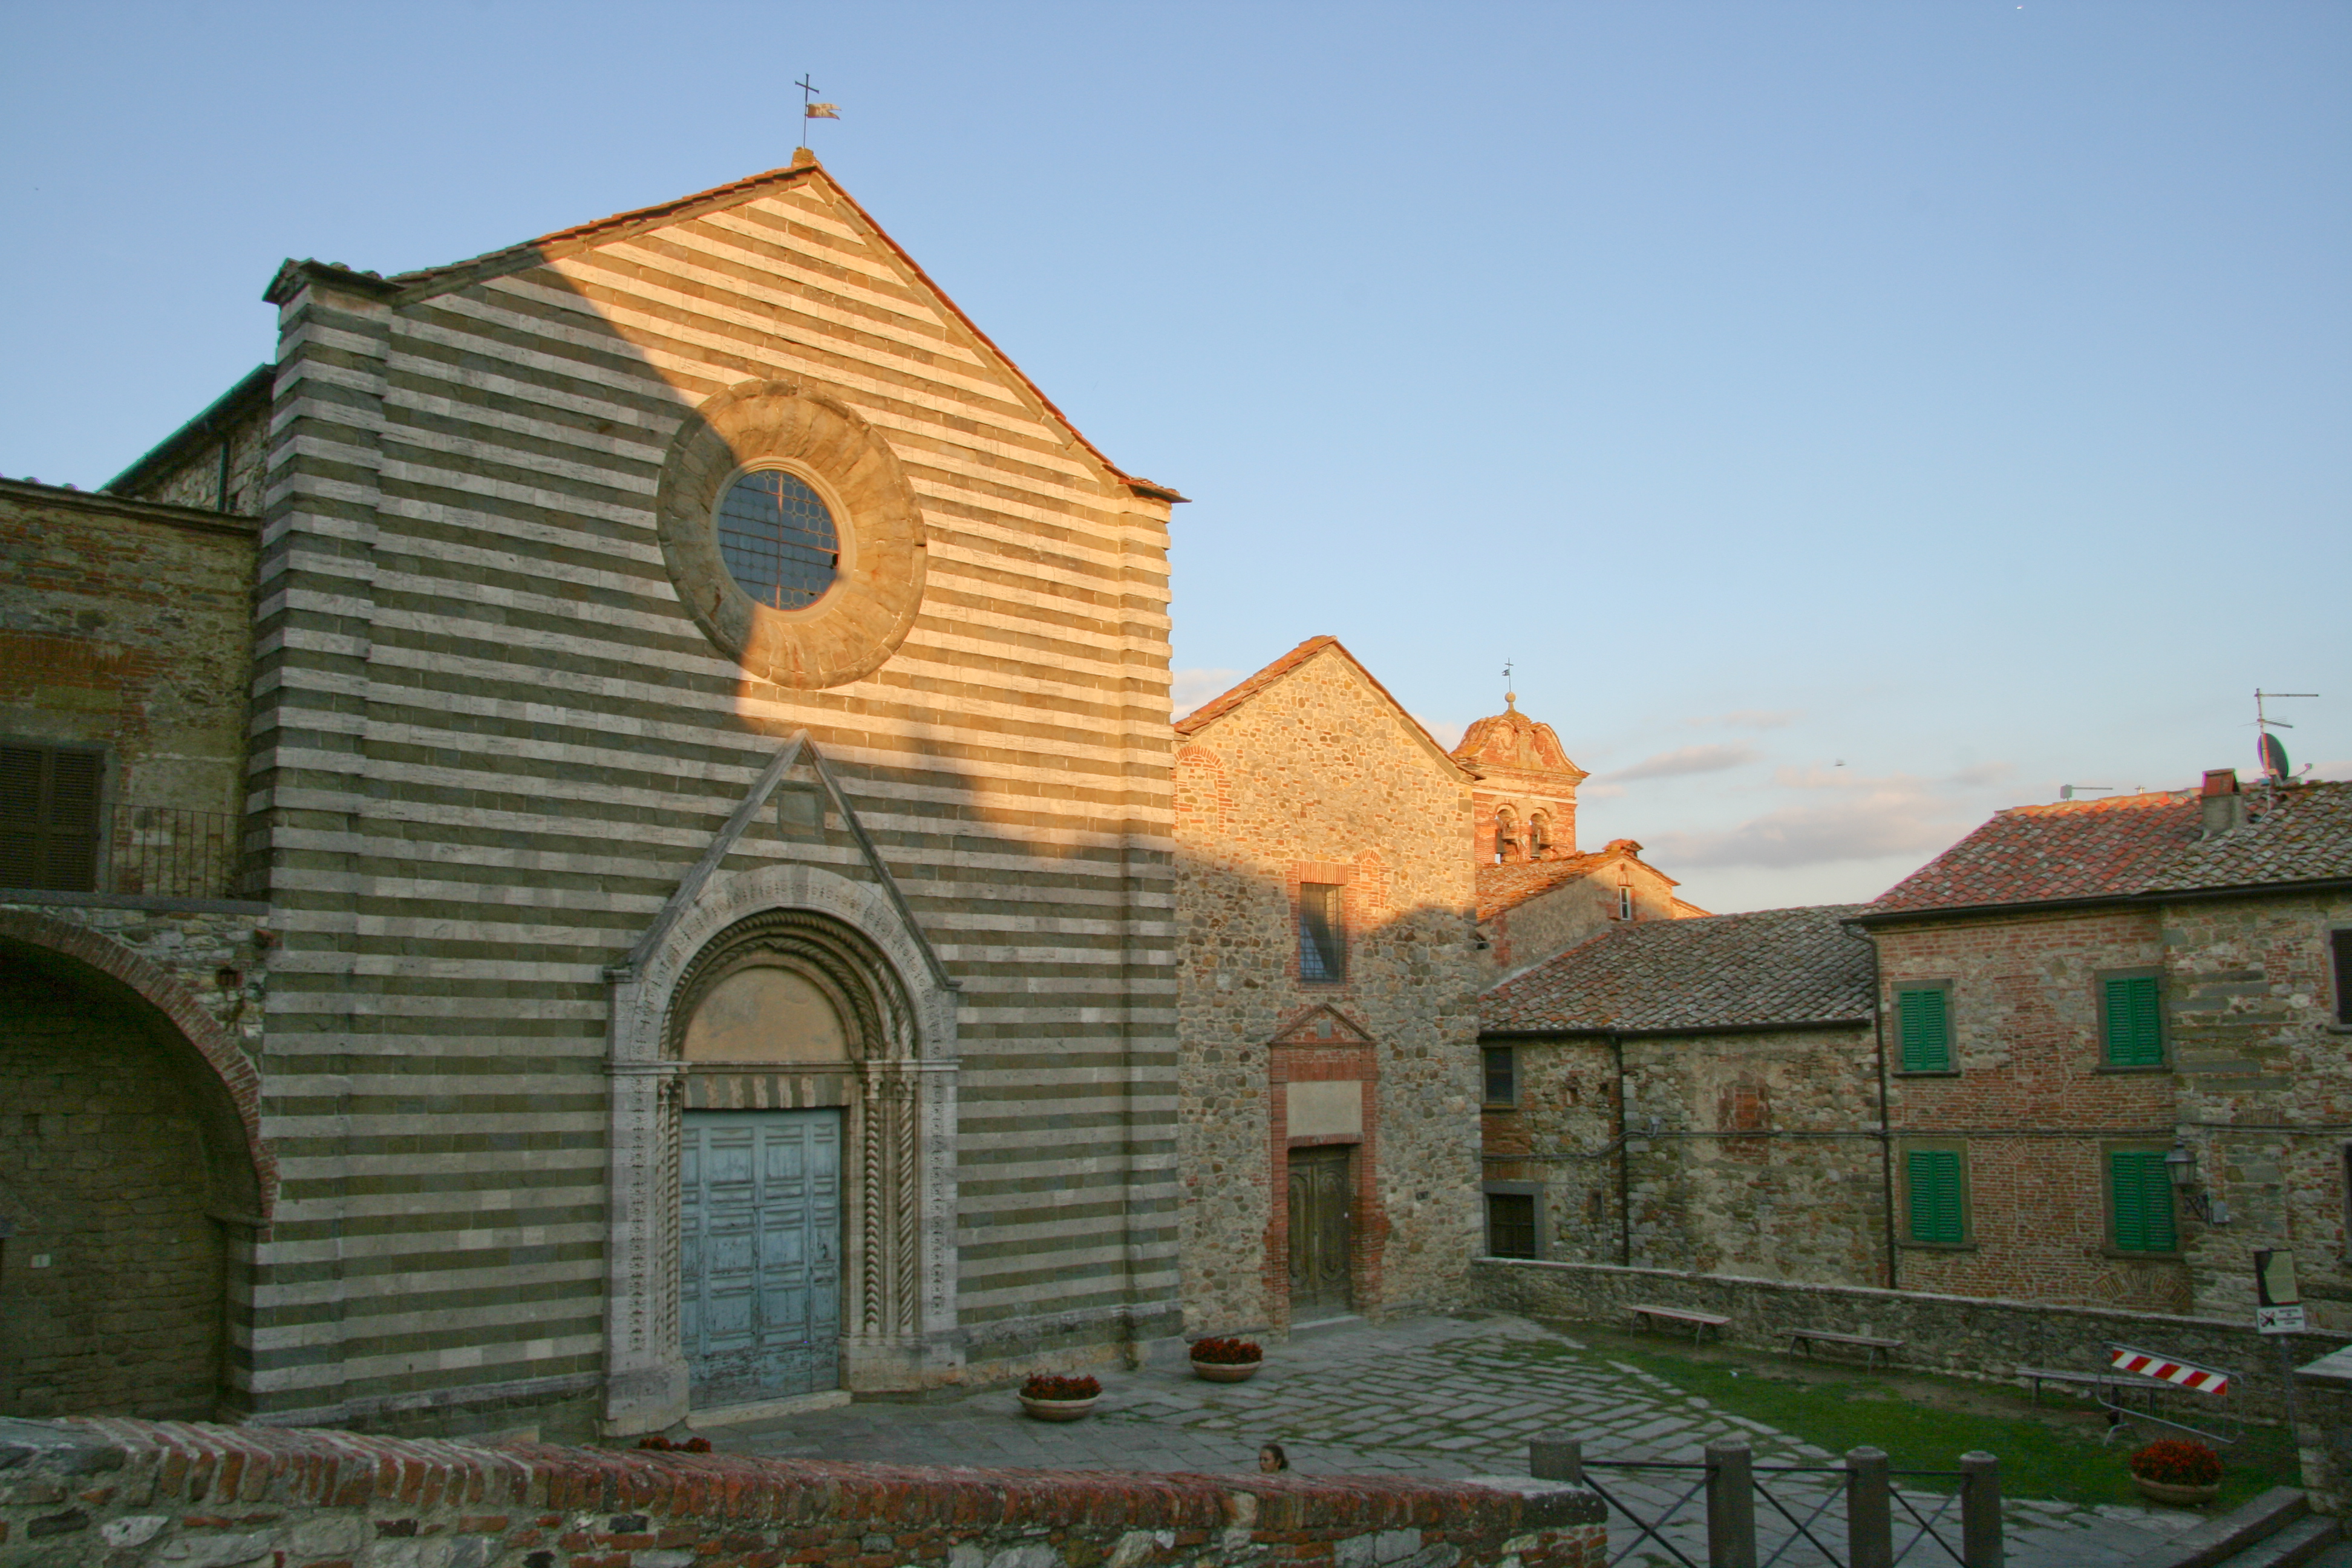 Chiesa di San Francesco, Lucignano